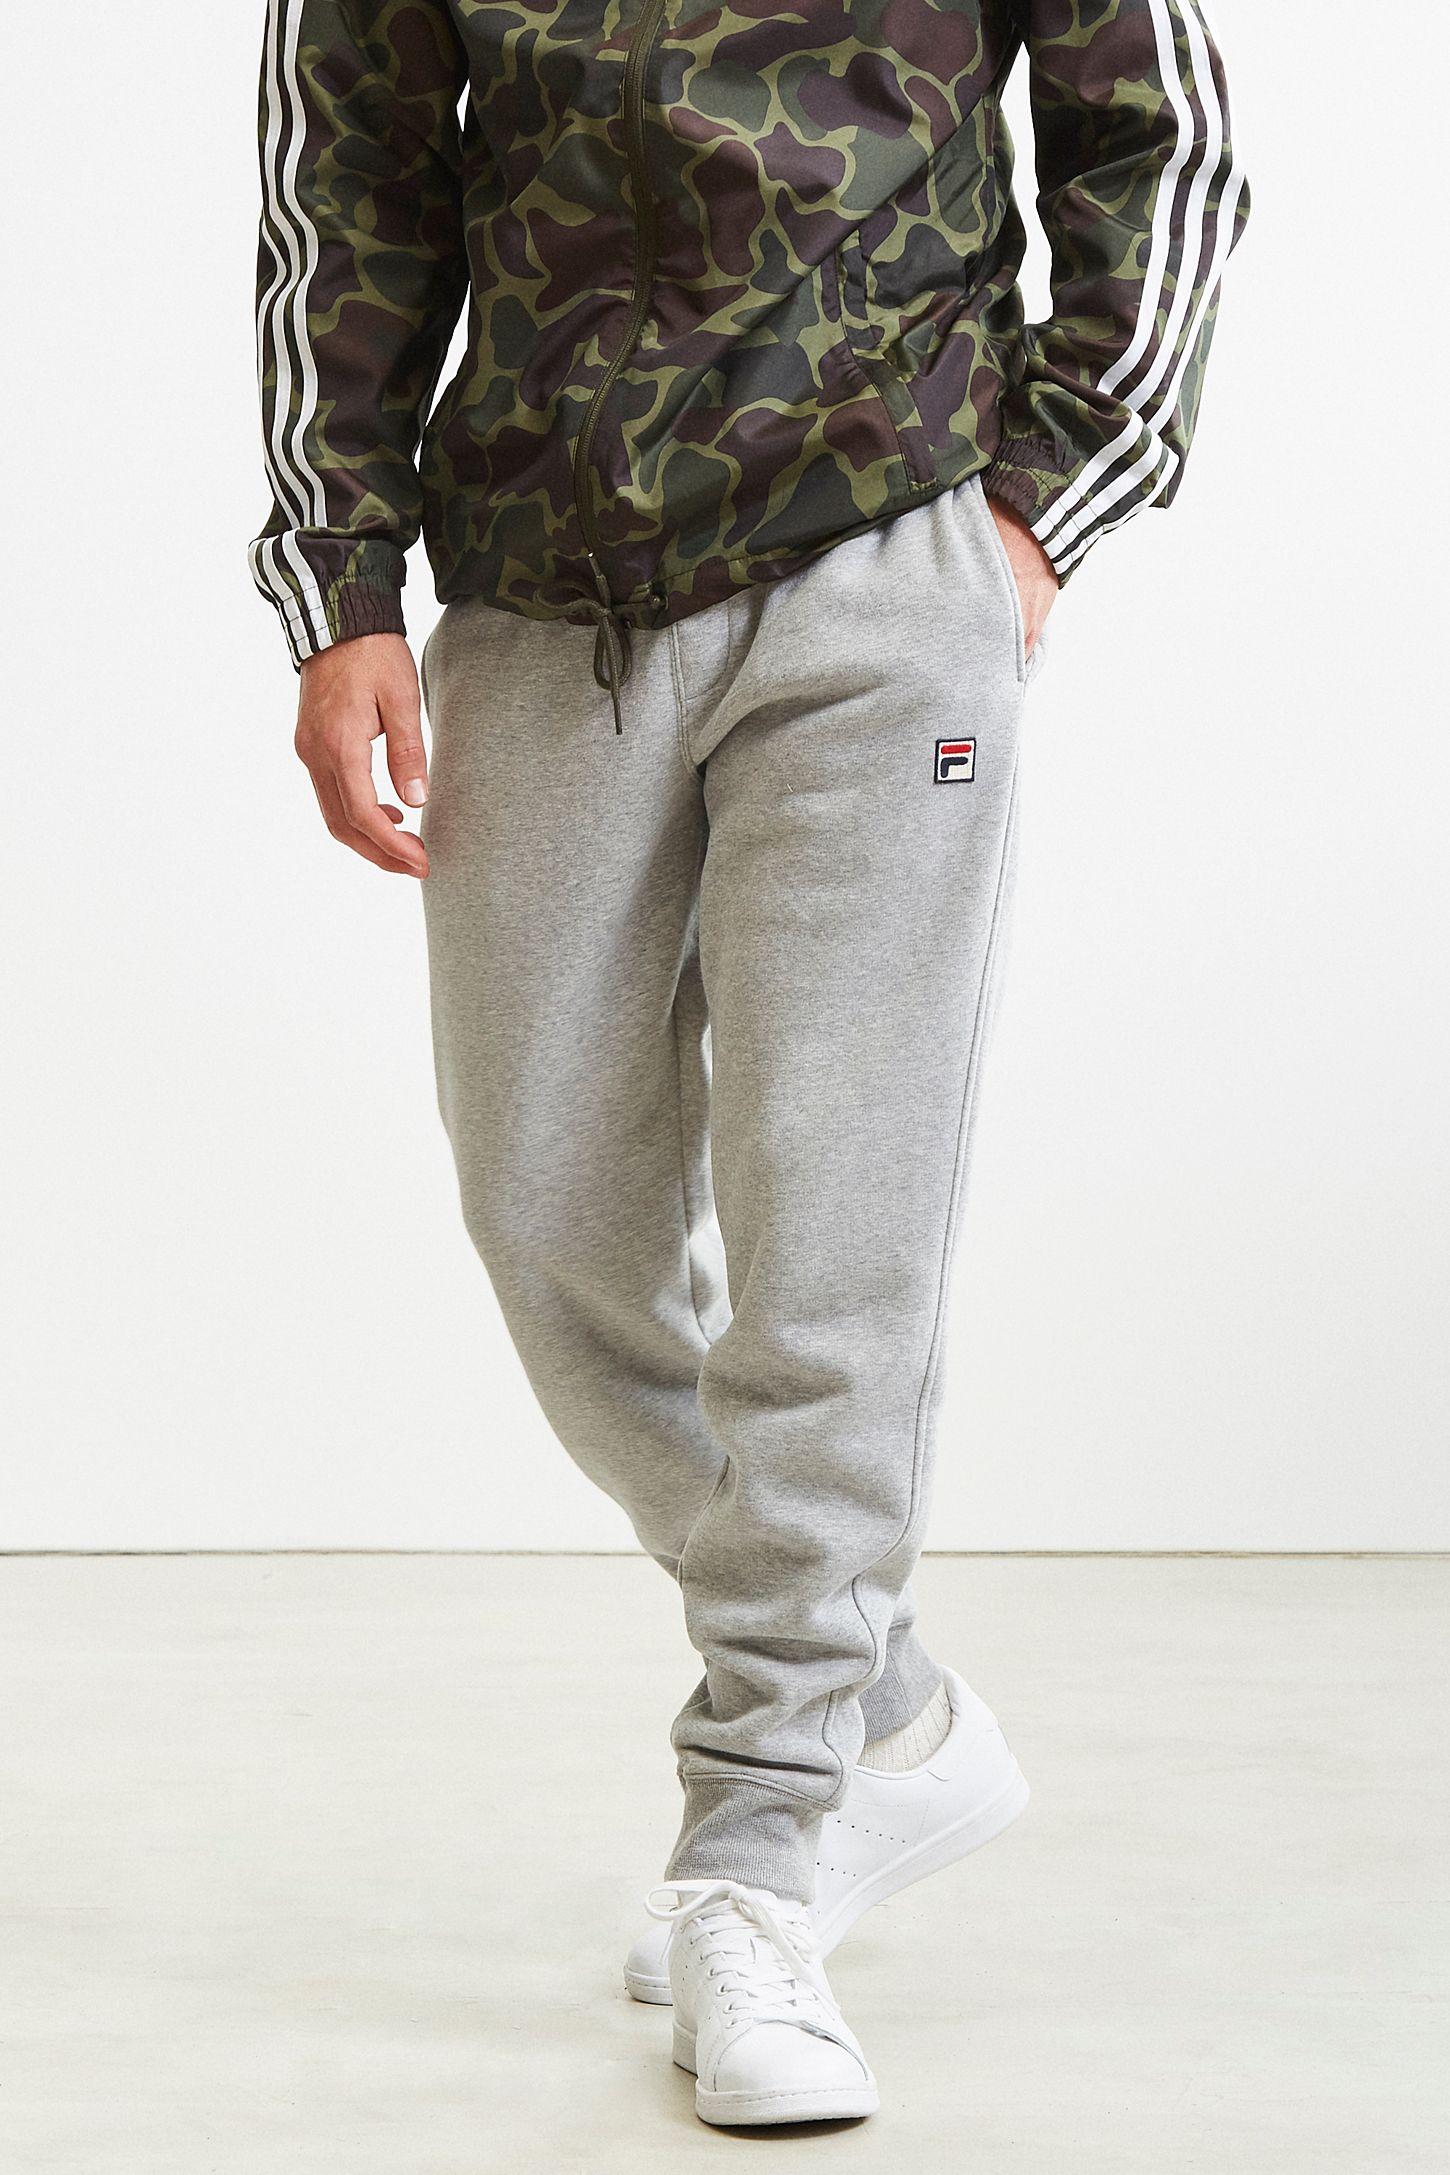 a0aa00963094a FILA Visconti Skinny Knit Jogger Pant | Urban Outfitters